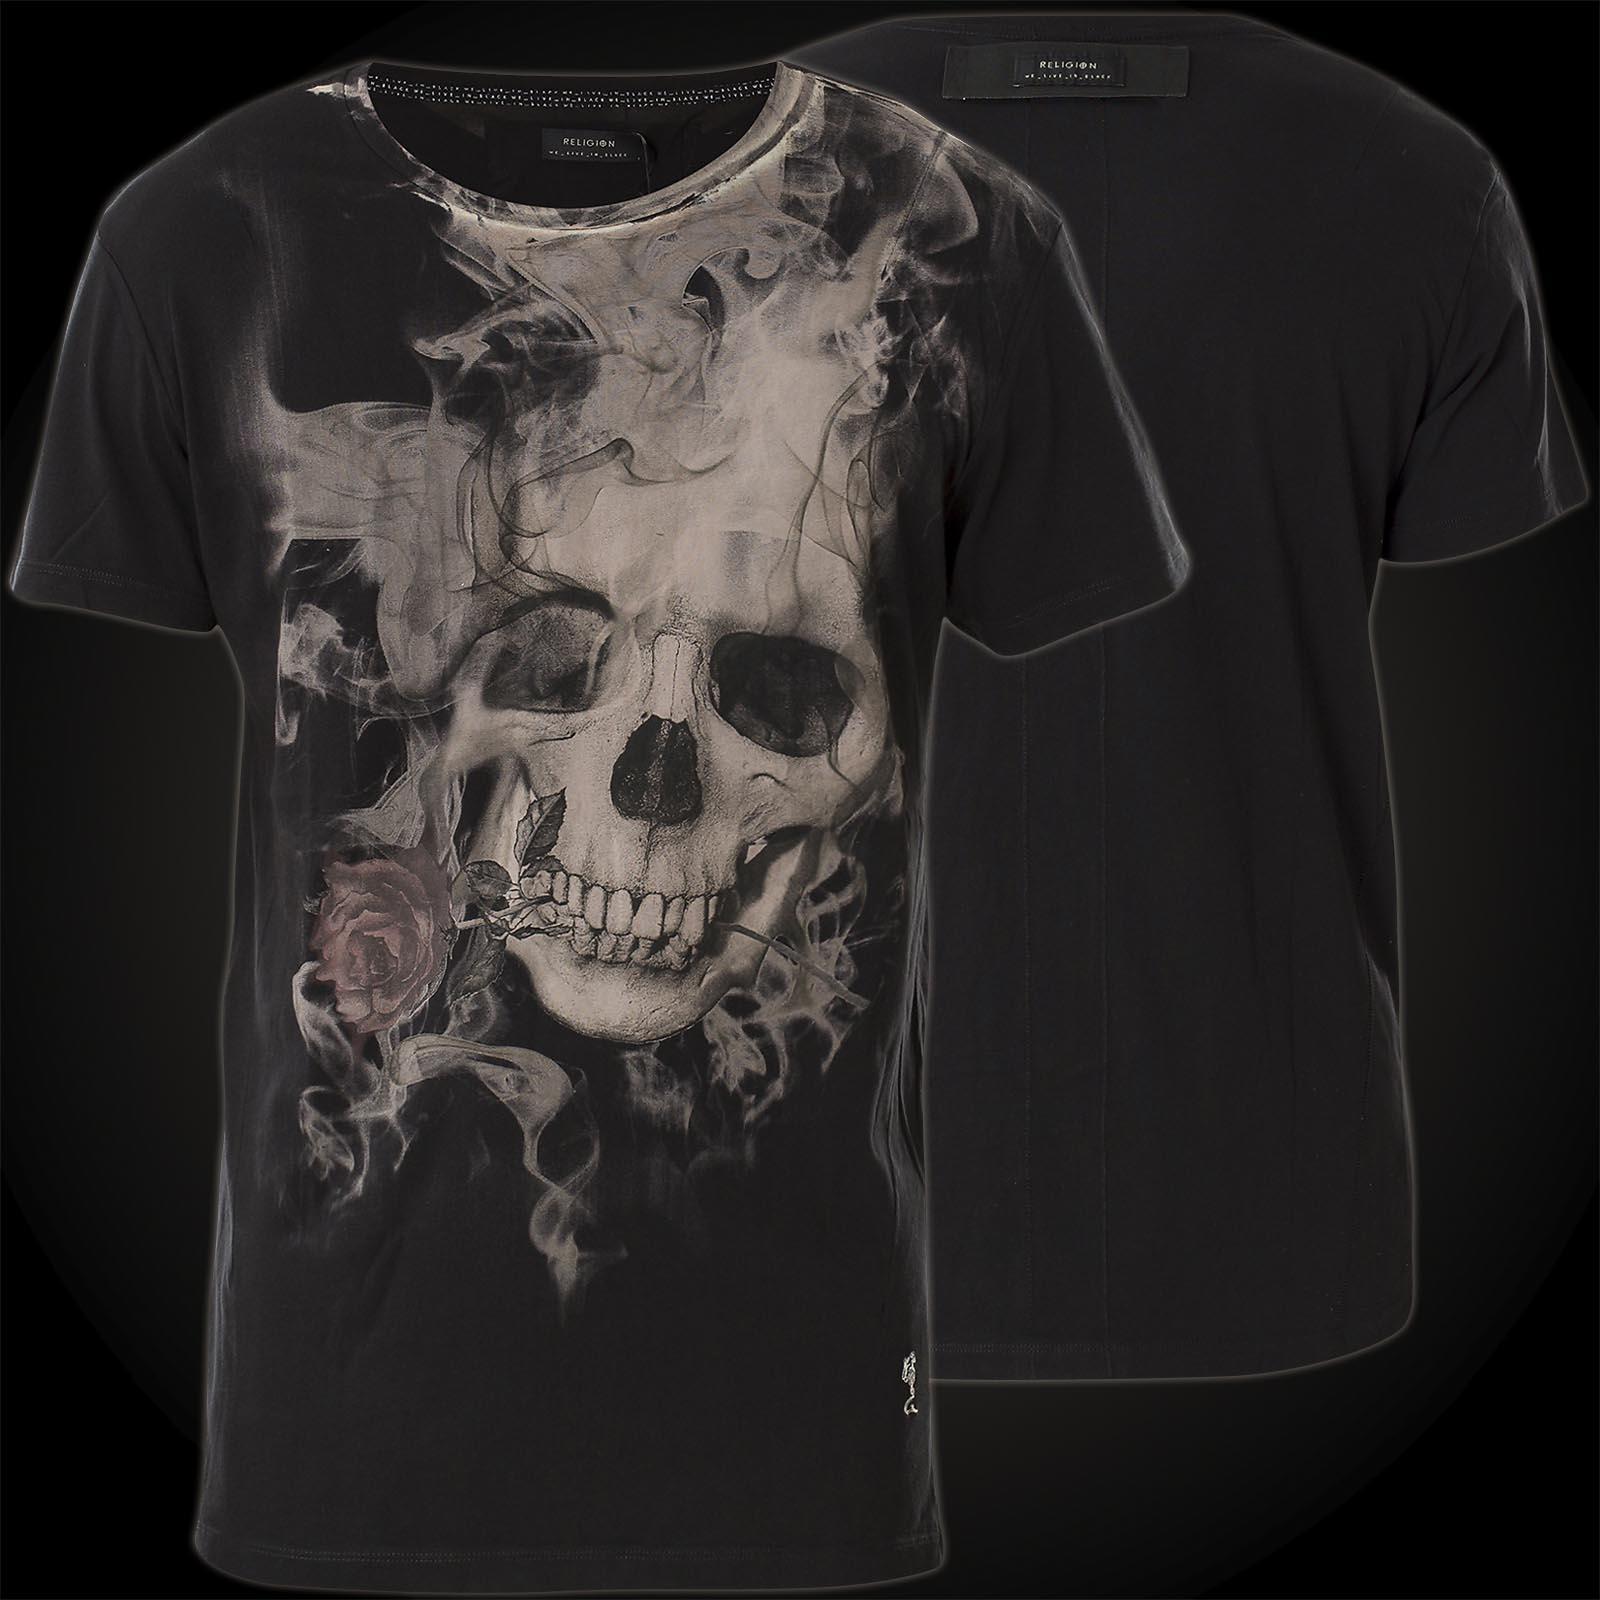 0aa33f07bd1091 Religion T-Shirt Smokey Skull 37BSSF39 rauchender Totenkopf mit Rose